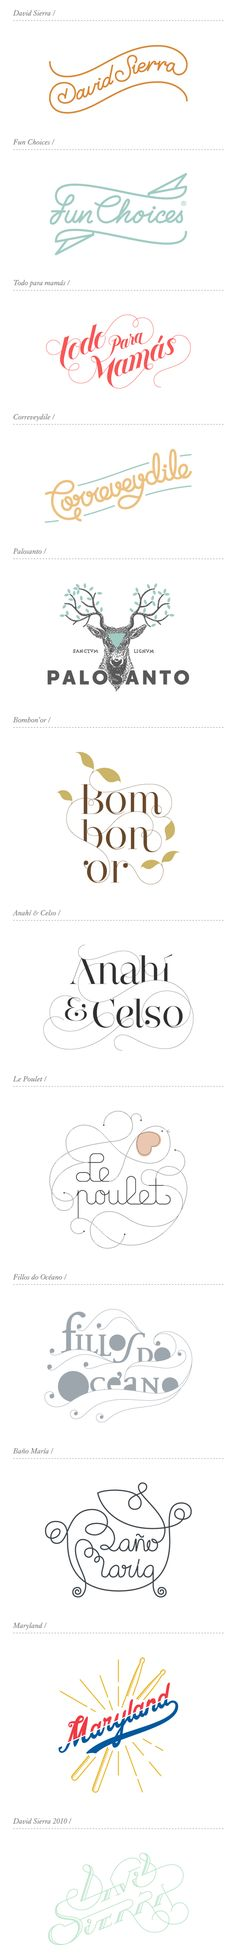 Logos by David Sierra, via Behance